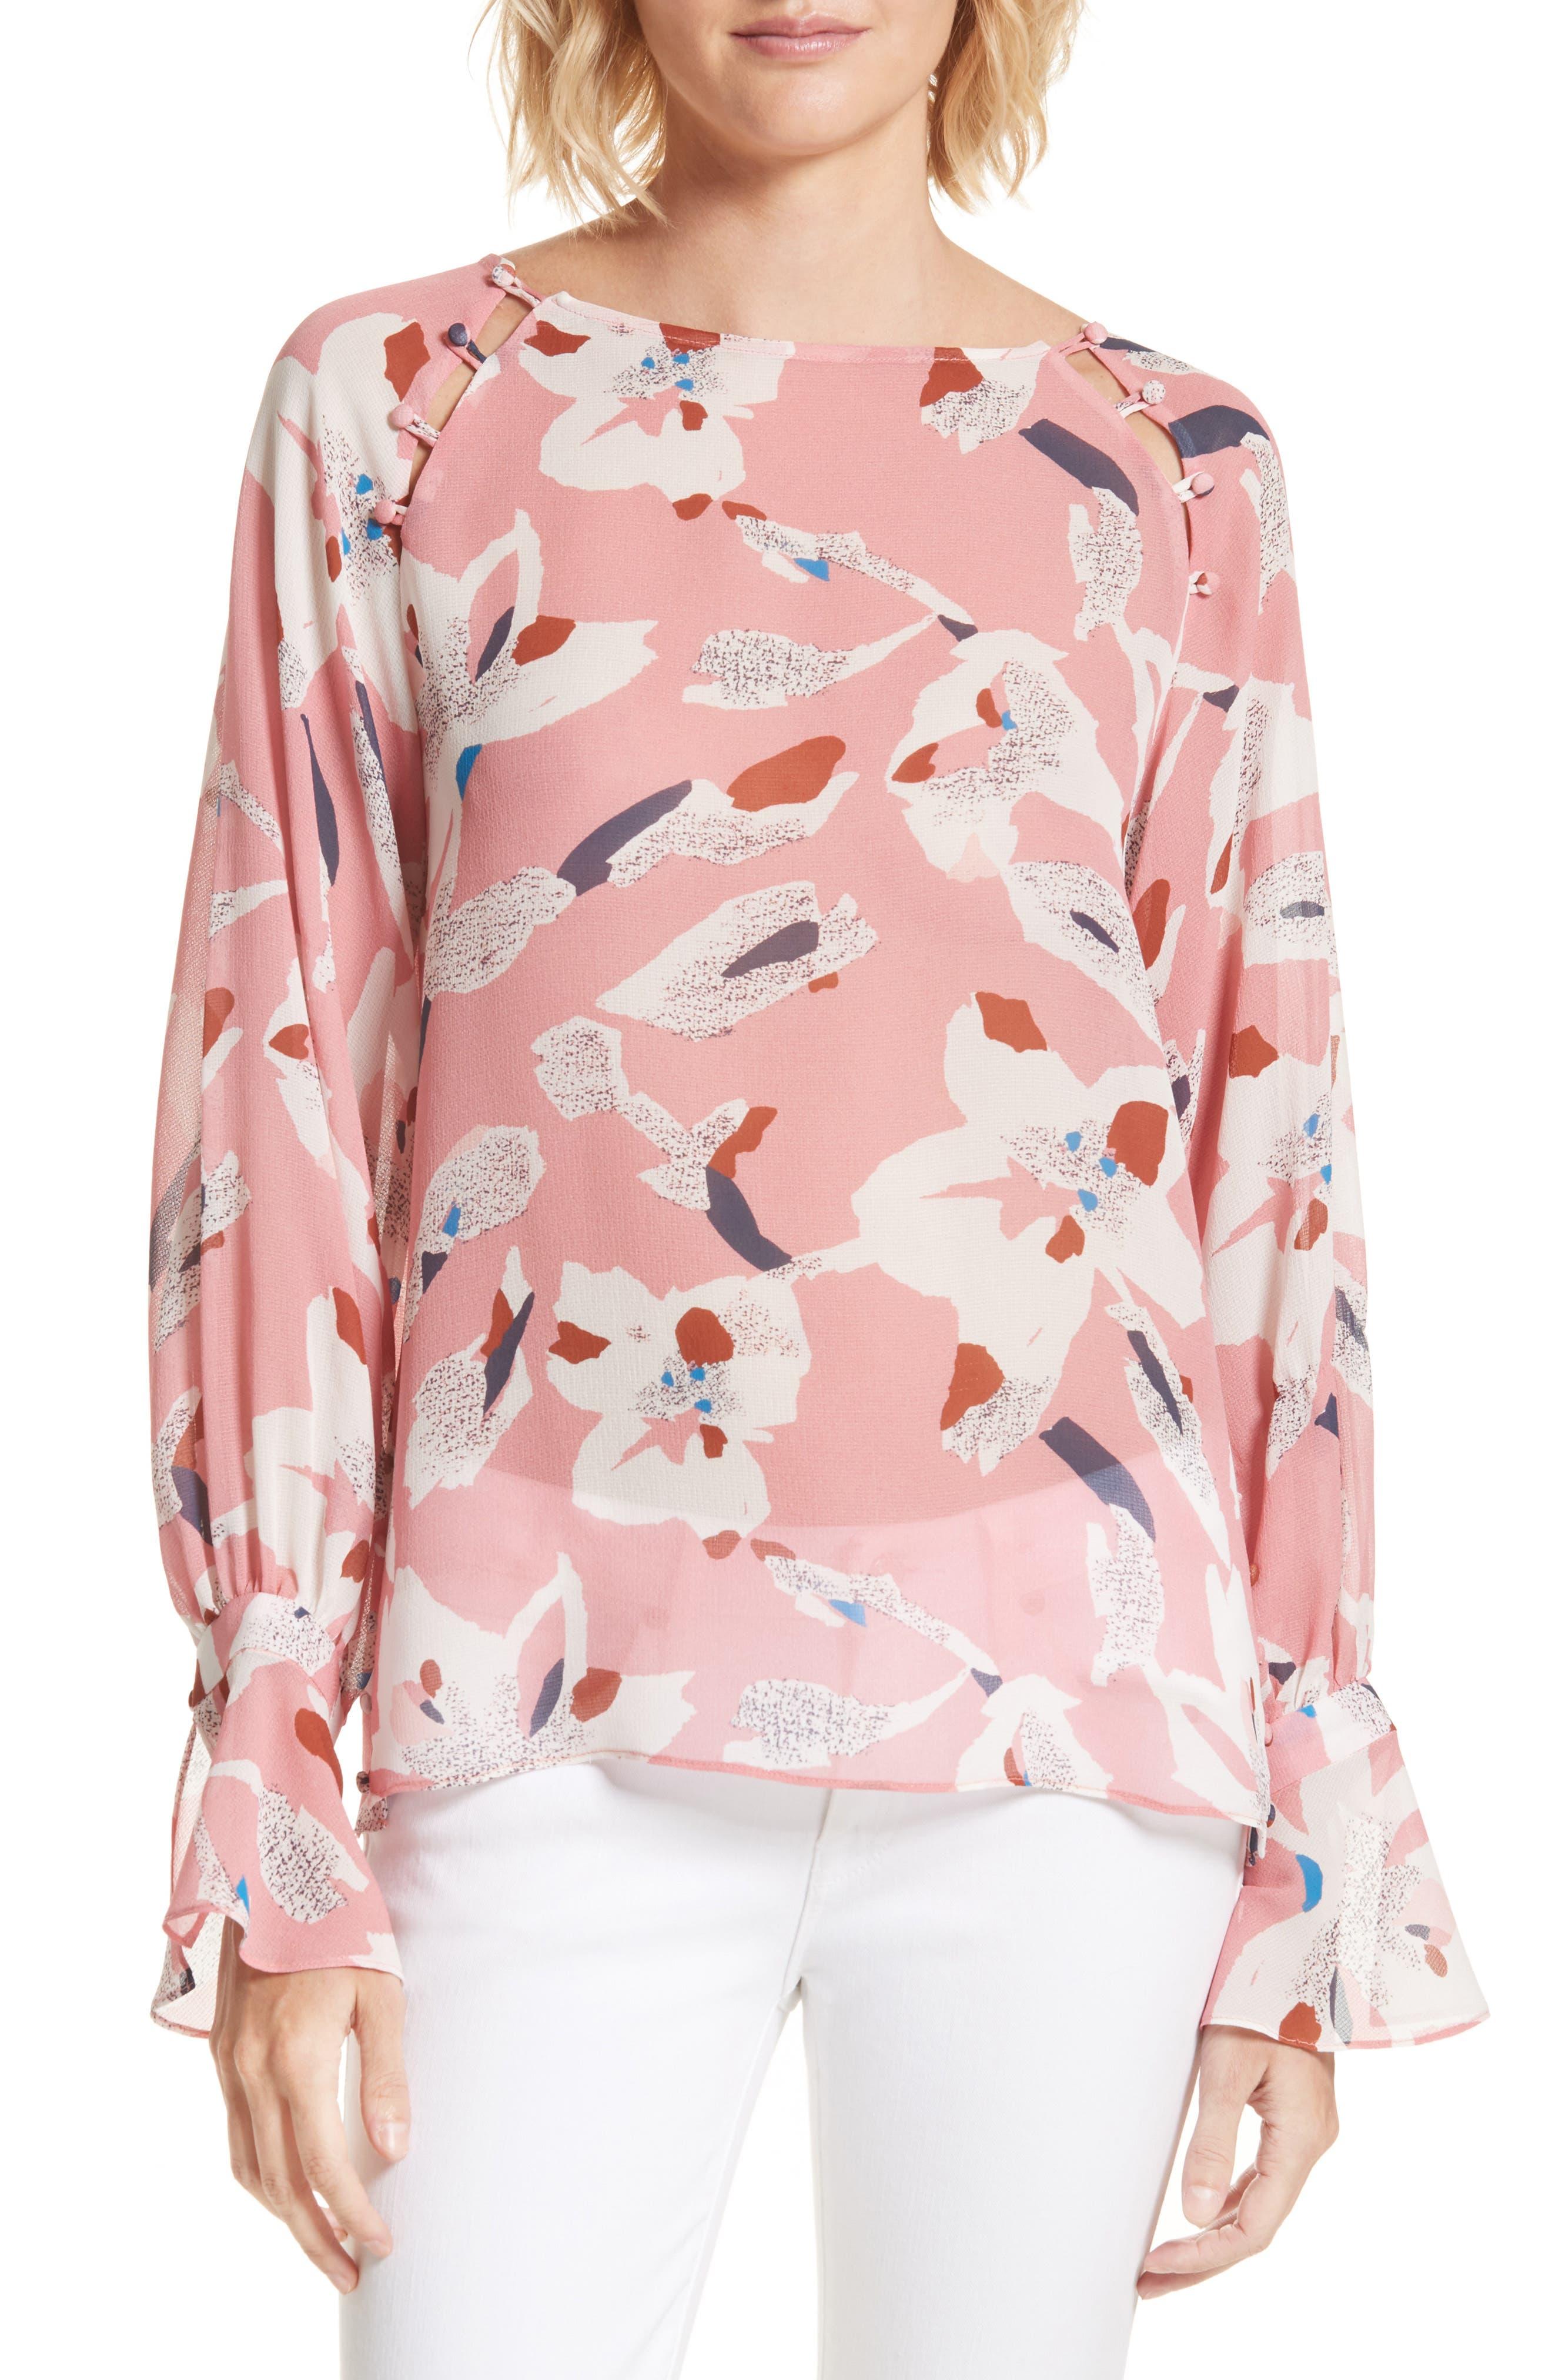 Tanya Taylor Samile Floral Print Silk Top